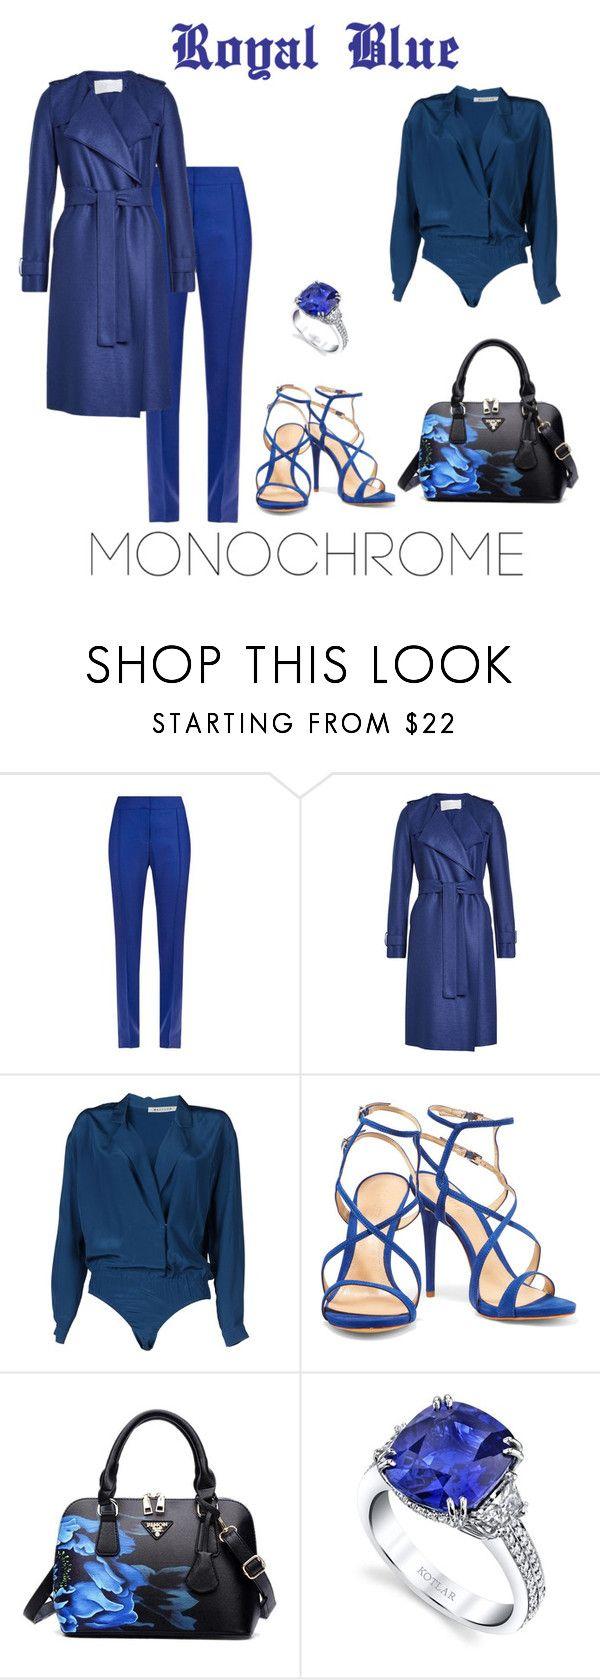 """Royal Blue Monochrome"" by zsugabubus ❤ liked on Polyvore featuring STELLA McCARTNEY, Harris Wharf London, MASSCOB, Schutz and Harry Kotlar"